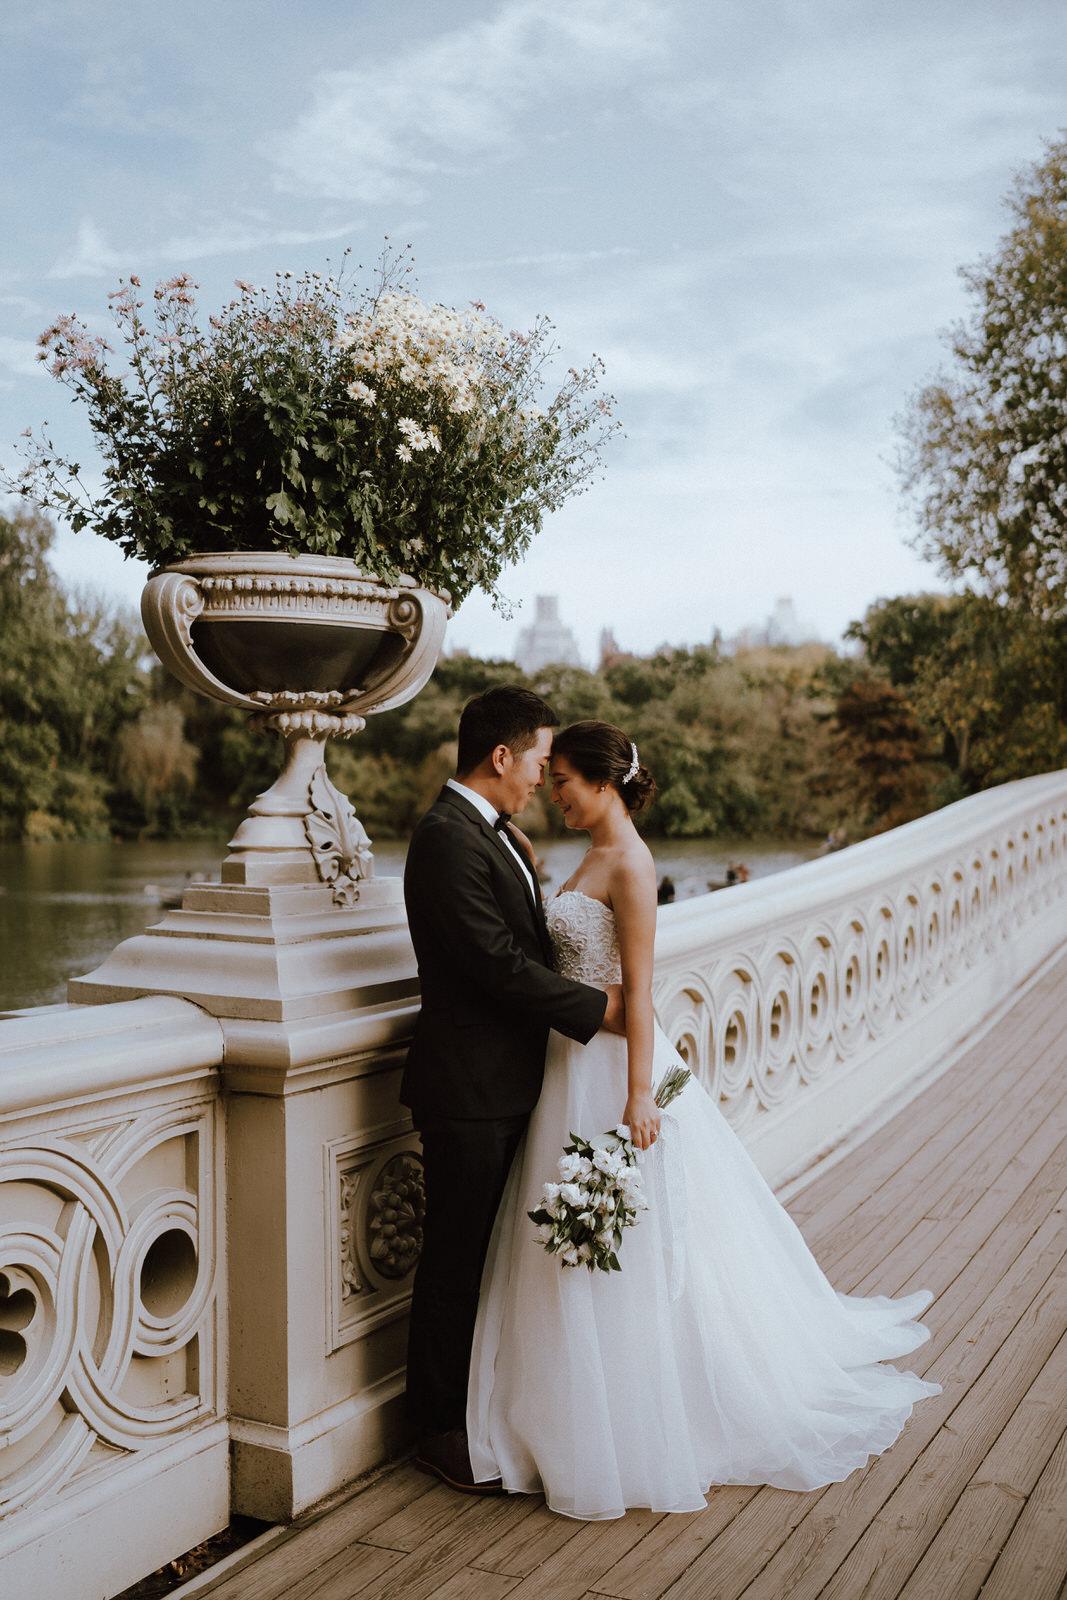 Central Park Elopement Photos-Bow Bridge-Michelle Gonzalez Photography- New York Wedding Photographer-2.jpg